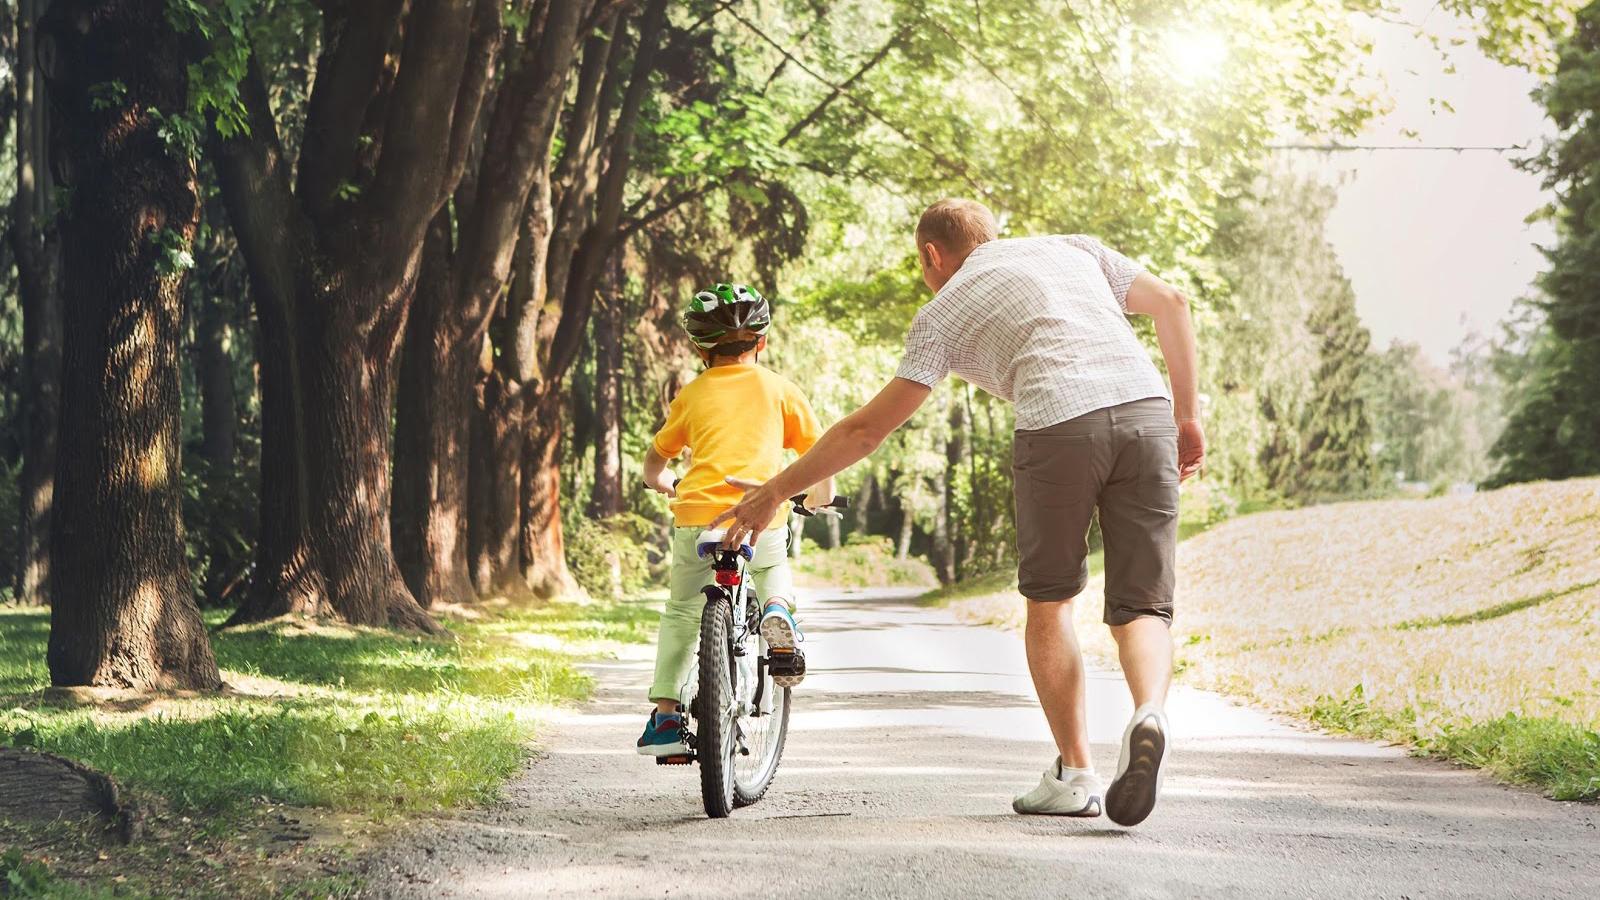 Datingside for syklister